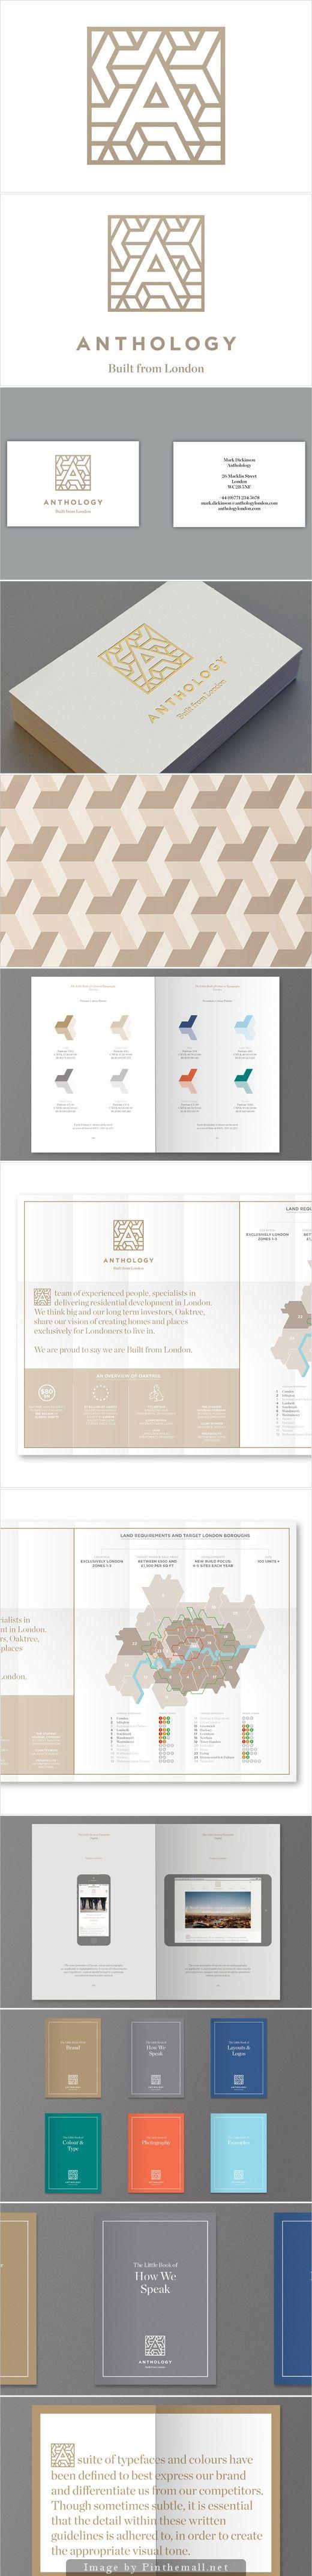 Greenspace Helps Shape 'Anthology' Property Brand